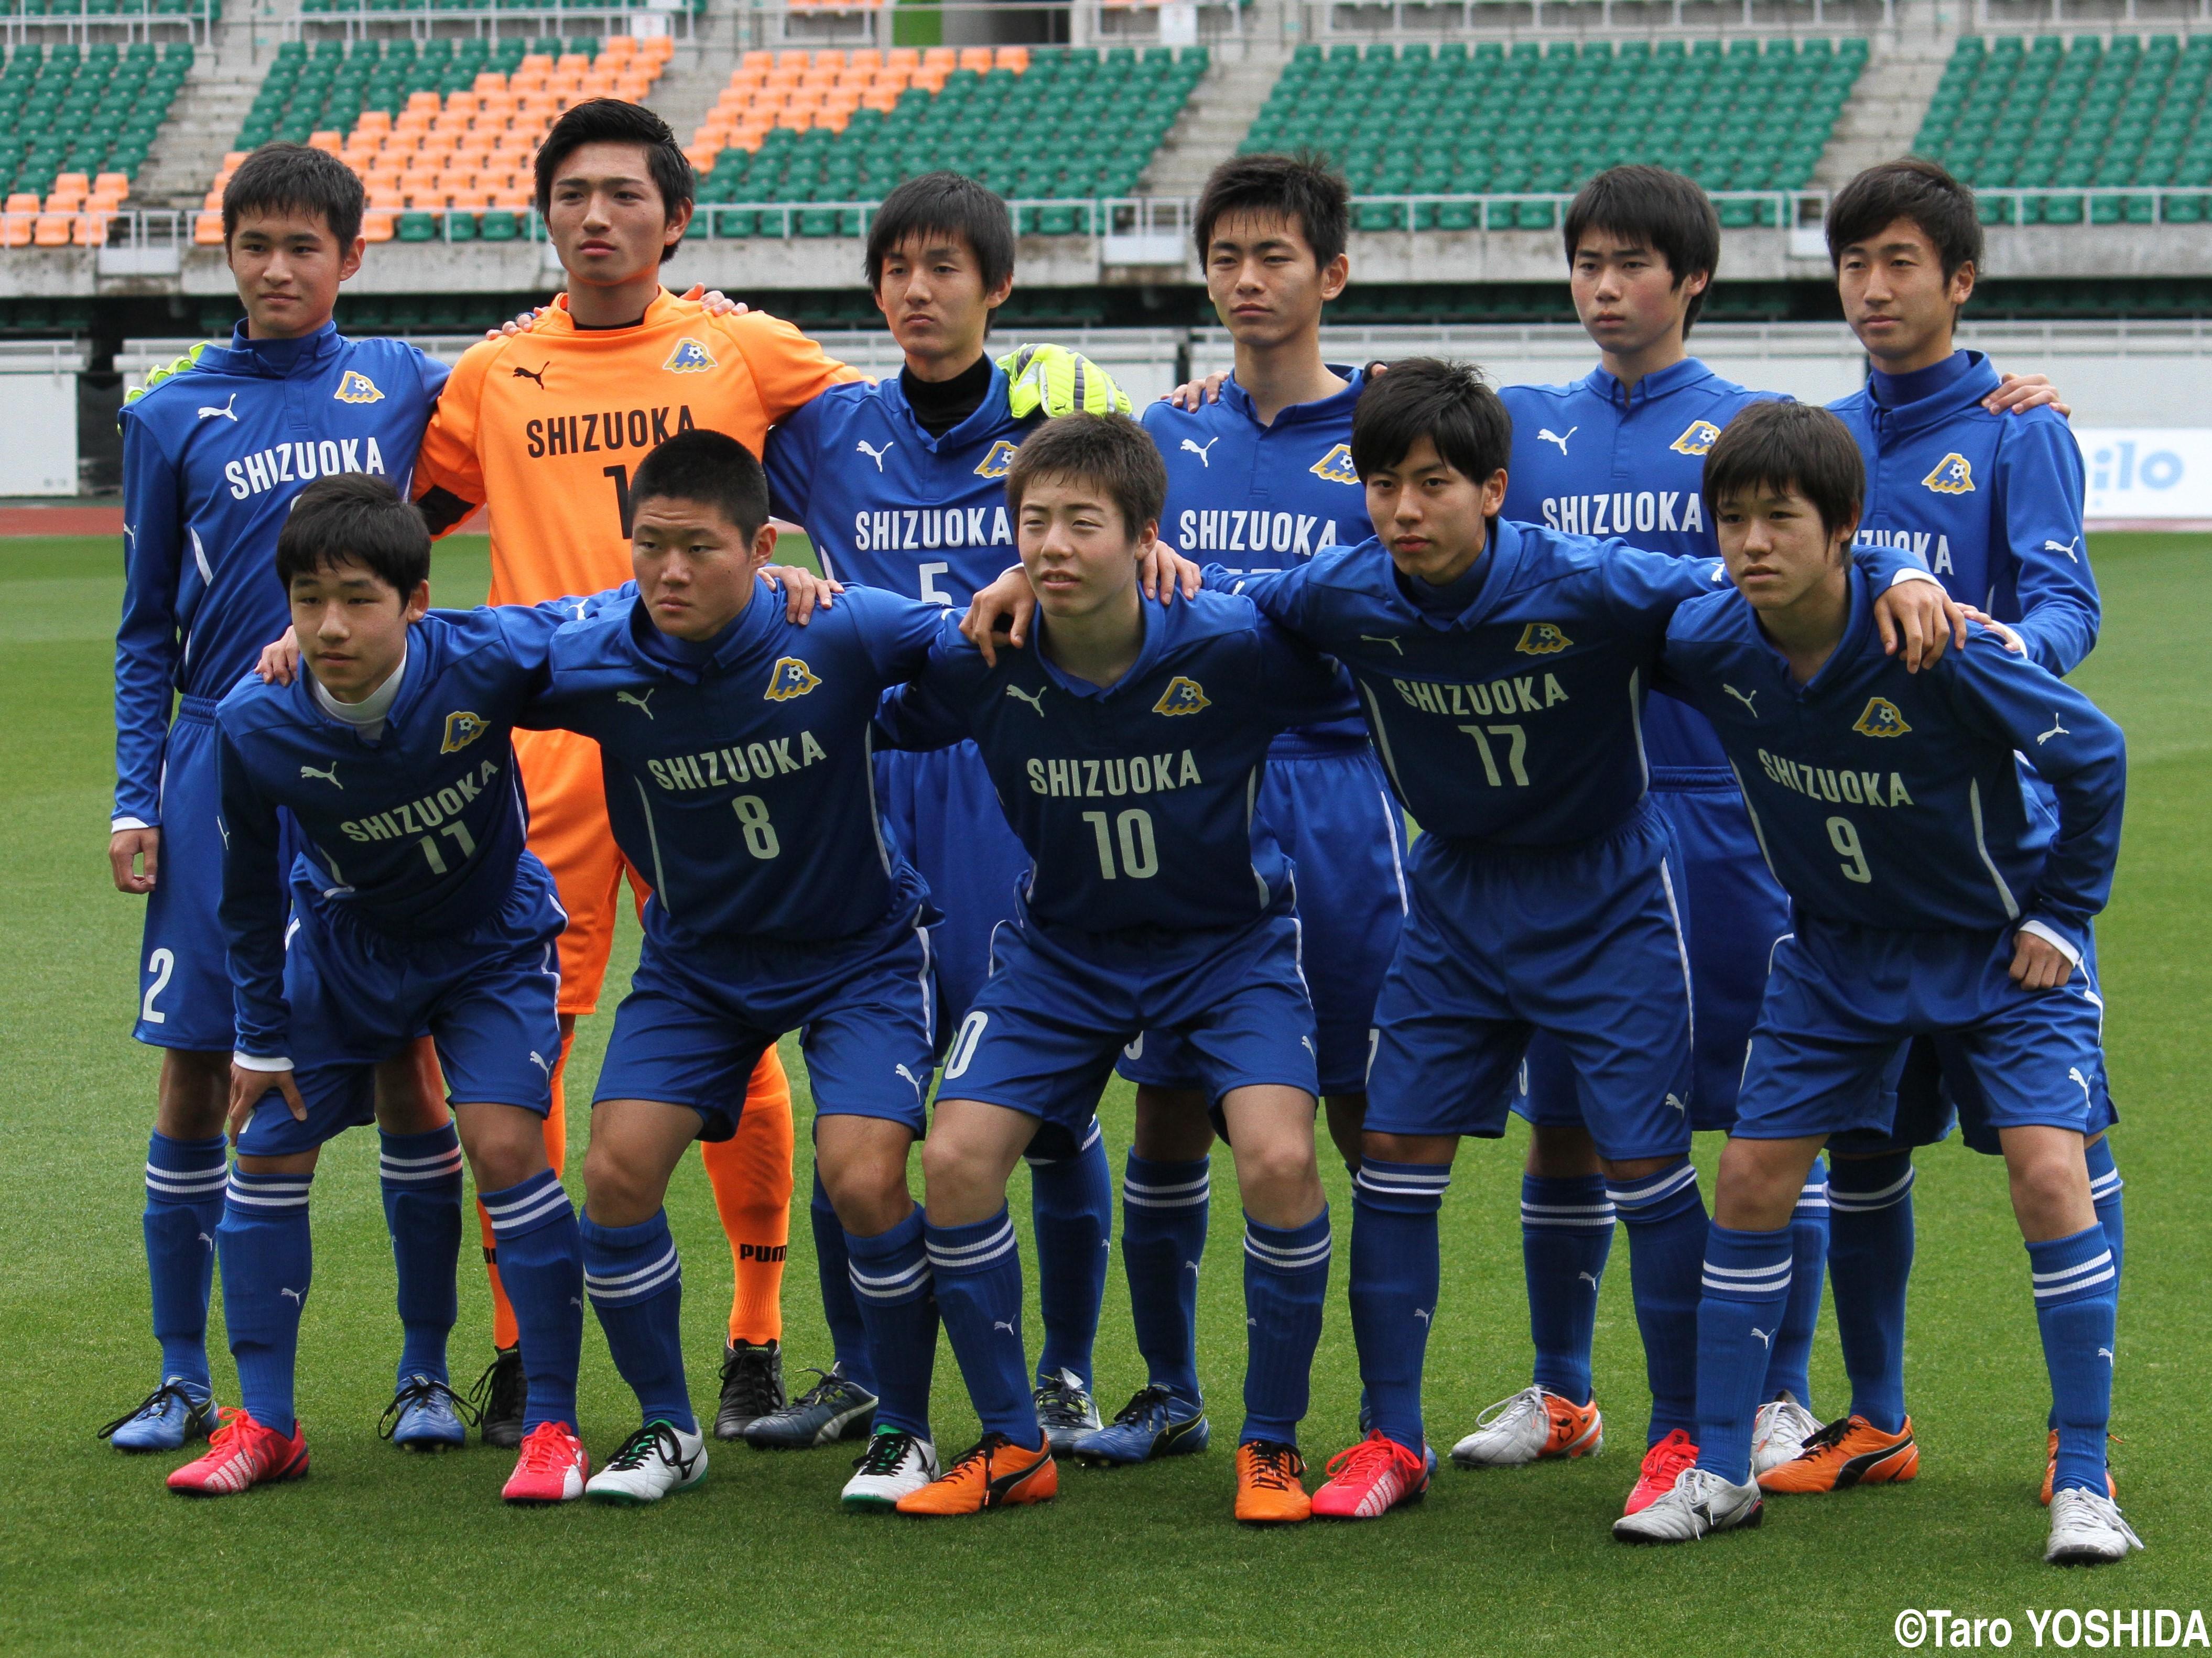 U-16静岡県選抜は鈴木魁先制ゴールも逆転負け・・・(24枚)